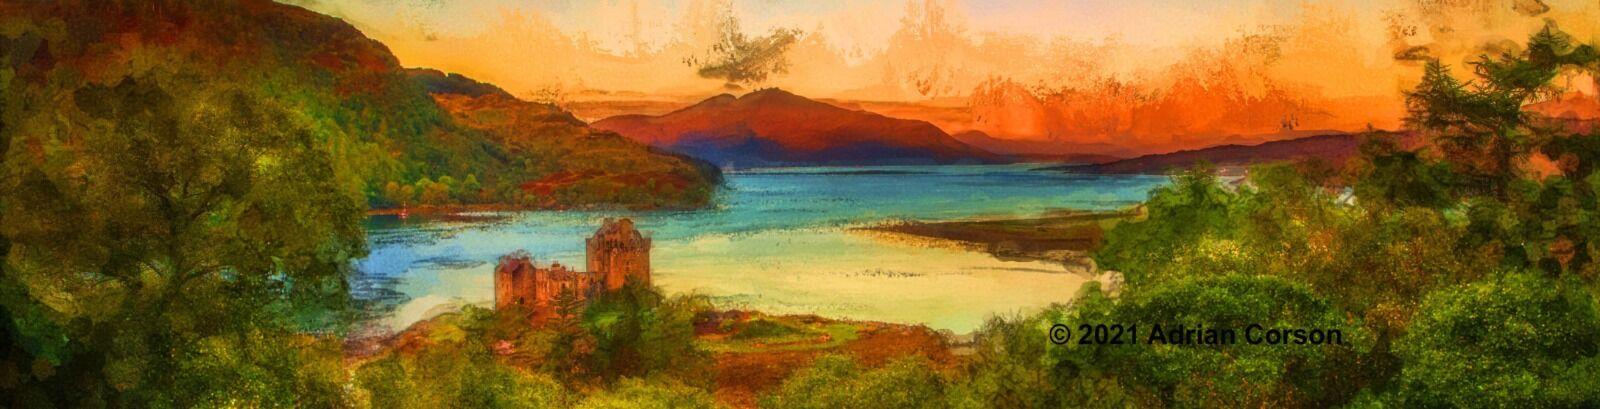 183-castle sunset